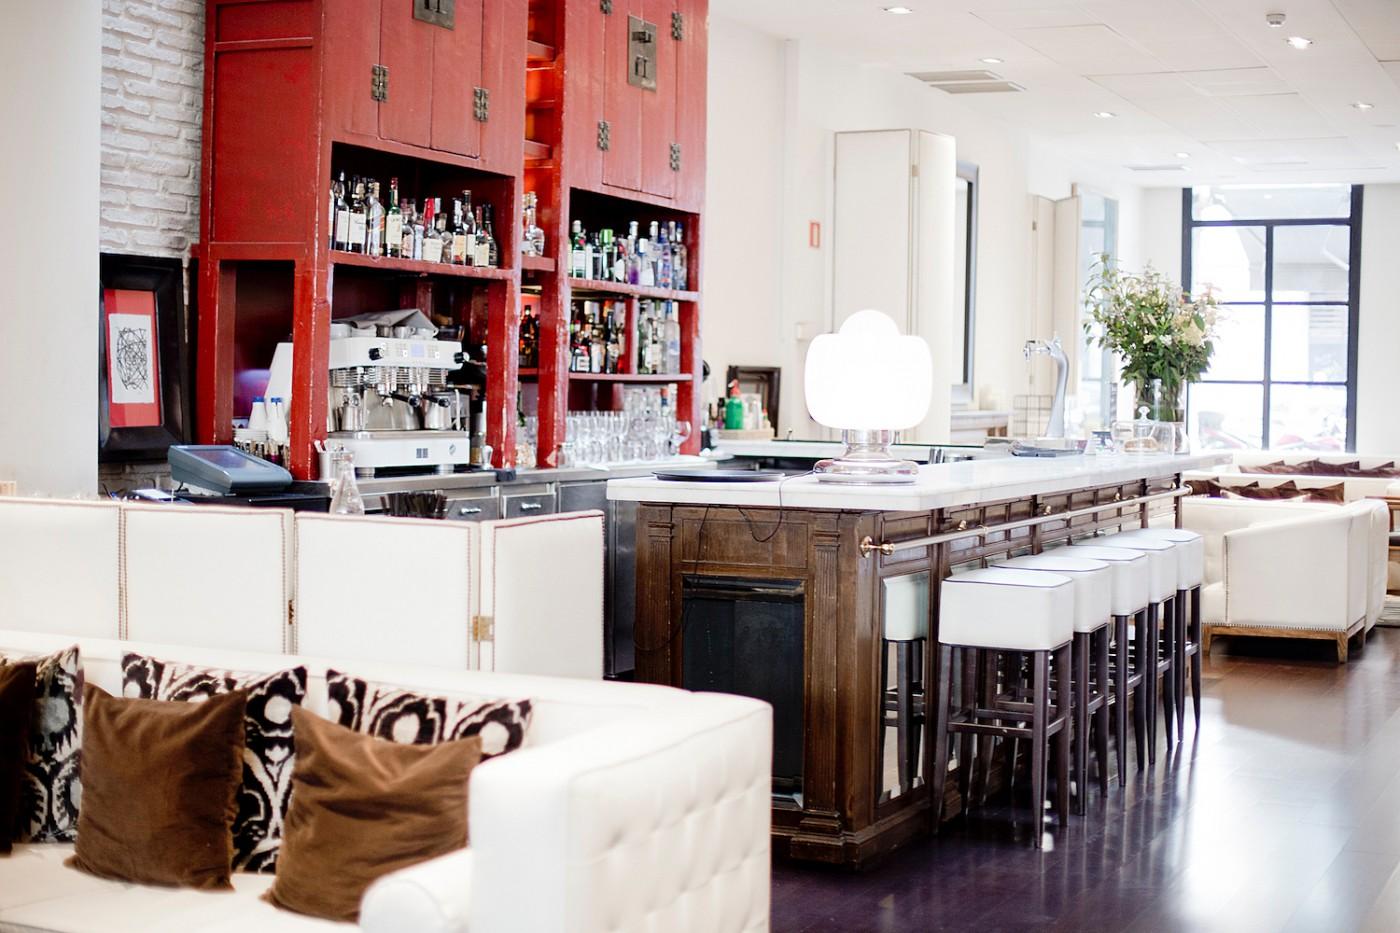 pulitzer hotel barcelona, hotels barcelona, where to stay in Barcelona, great hotels in Barcelona